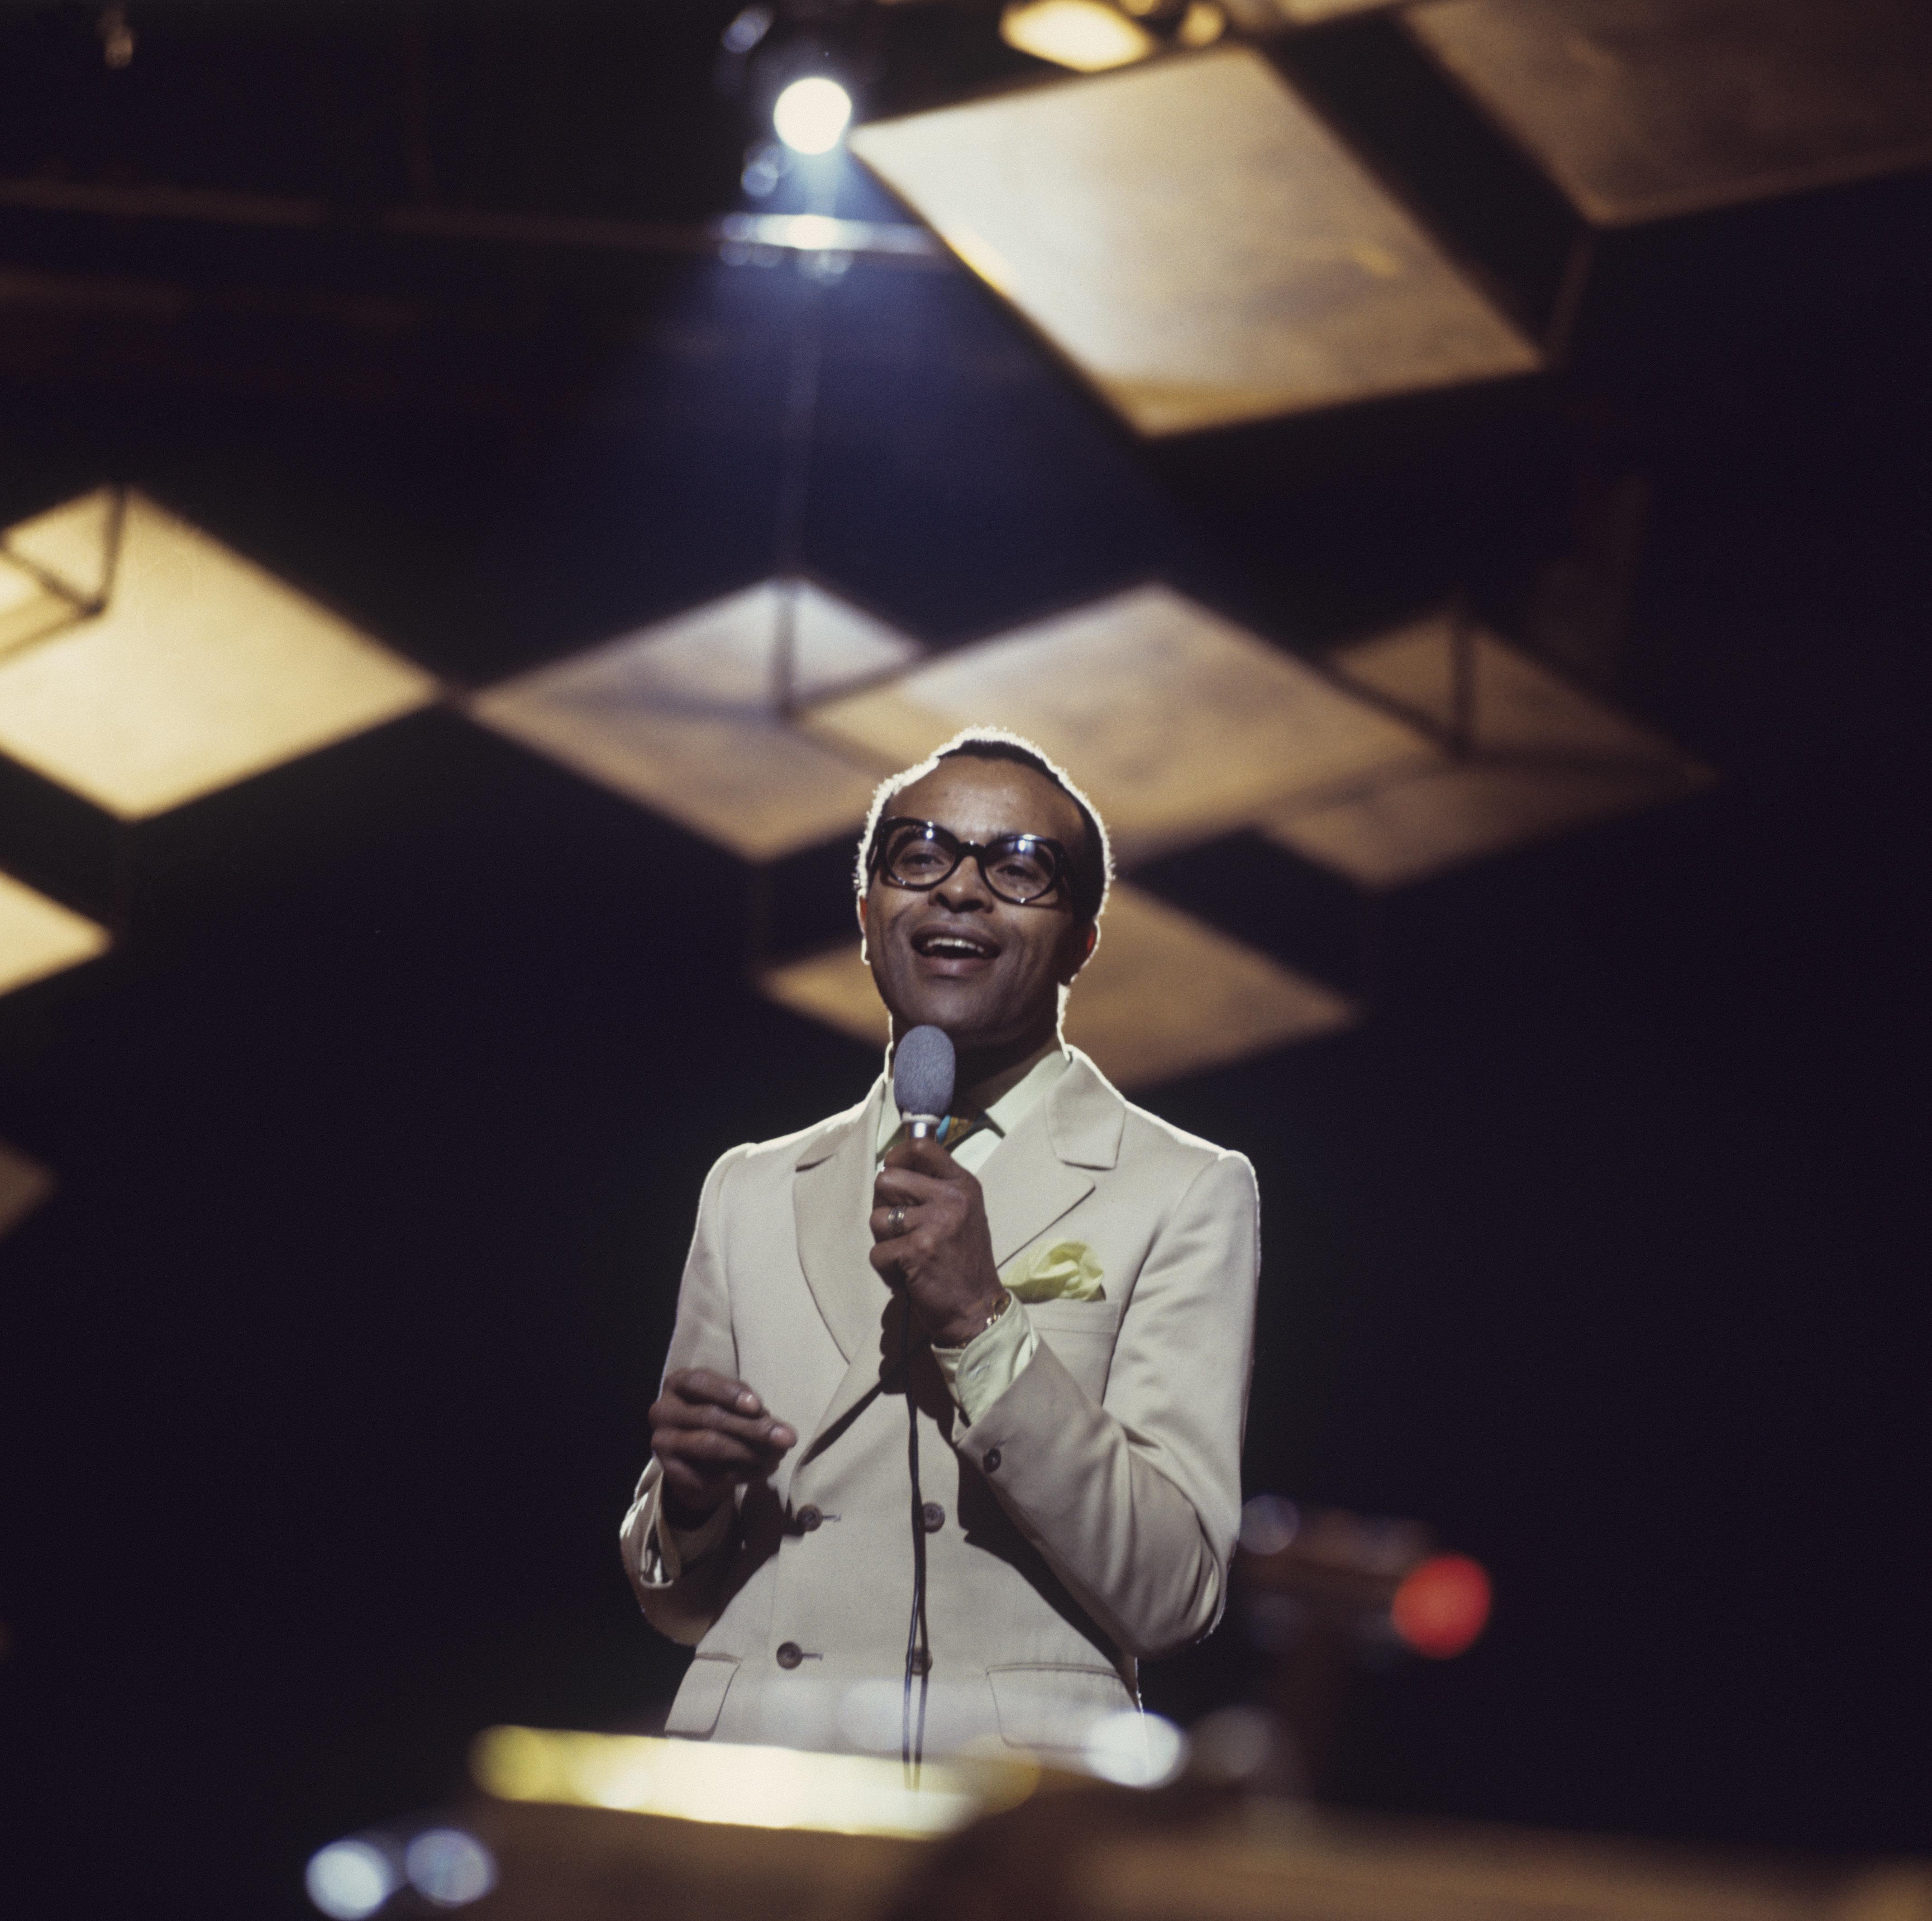 Jon Hendricks performs on stage in an undated photo taken around 1970.